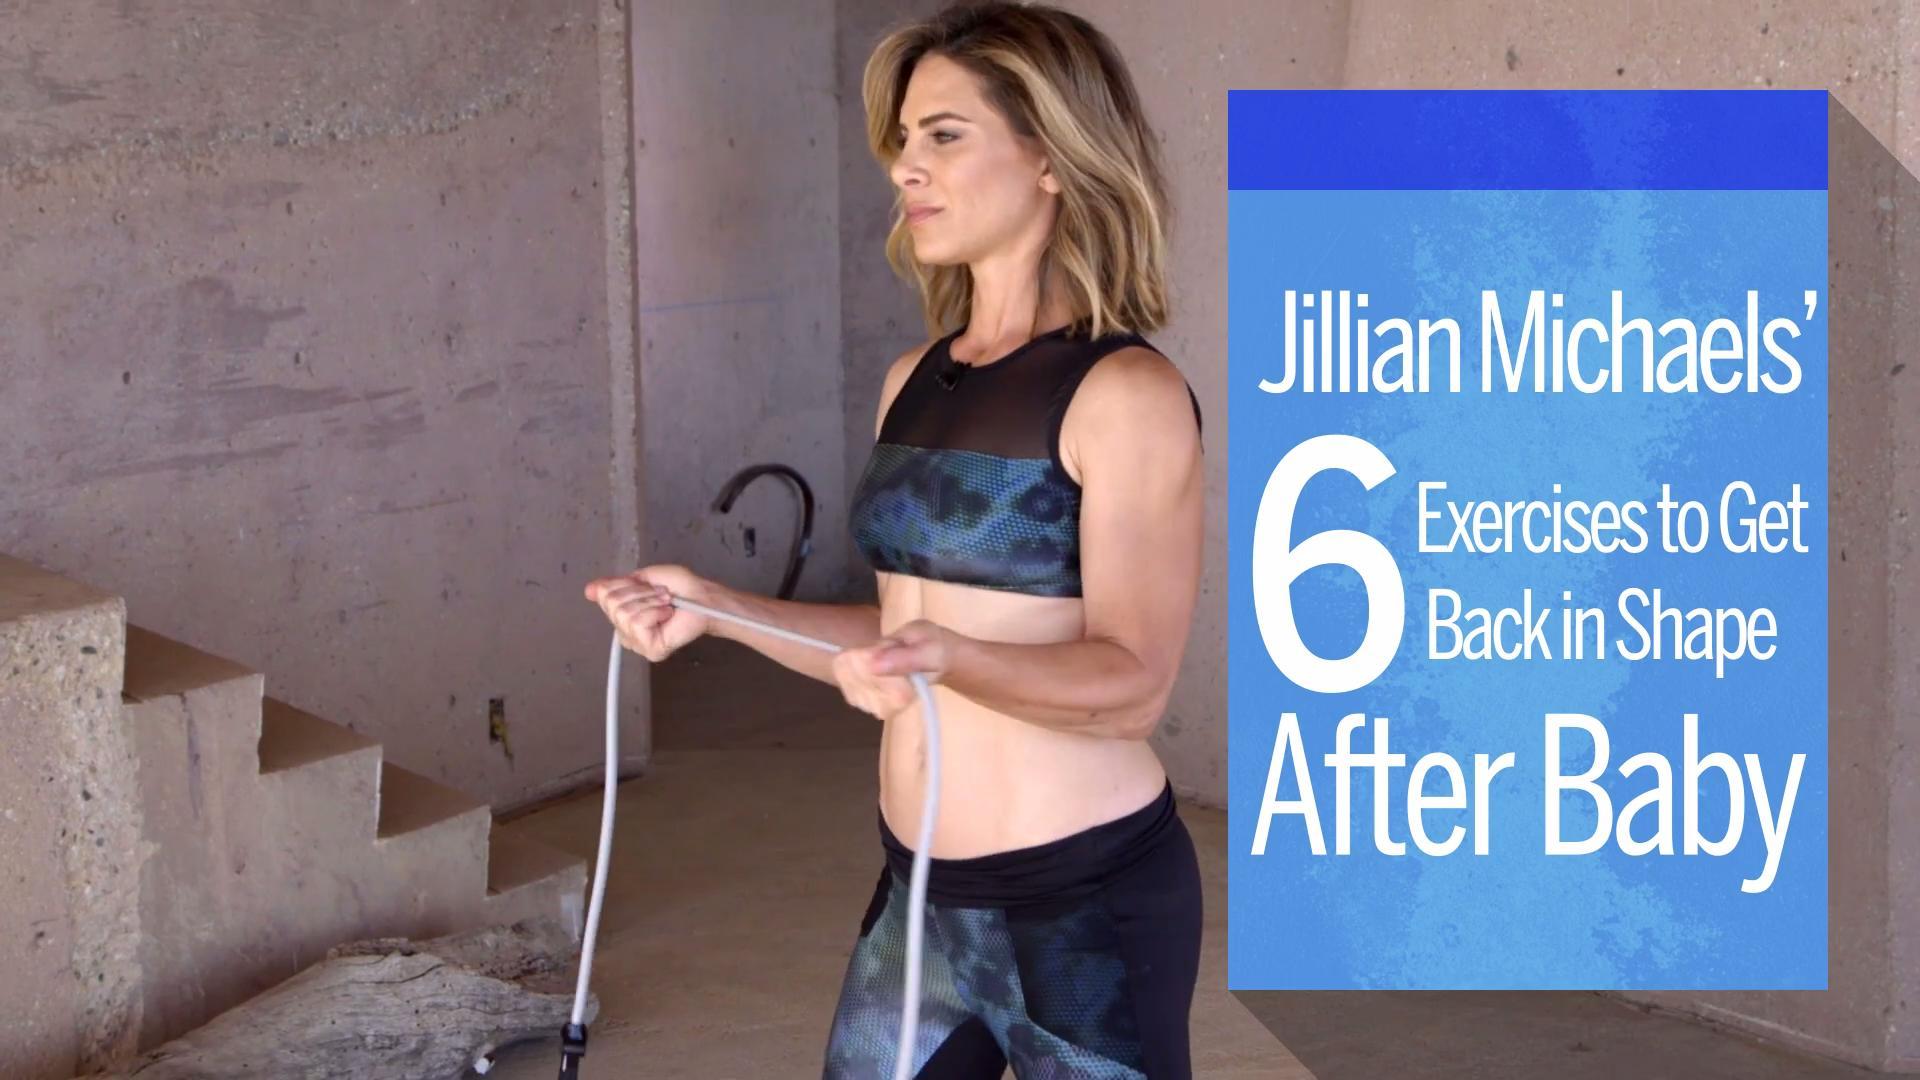 post pregnancy workout from jillian michaels health